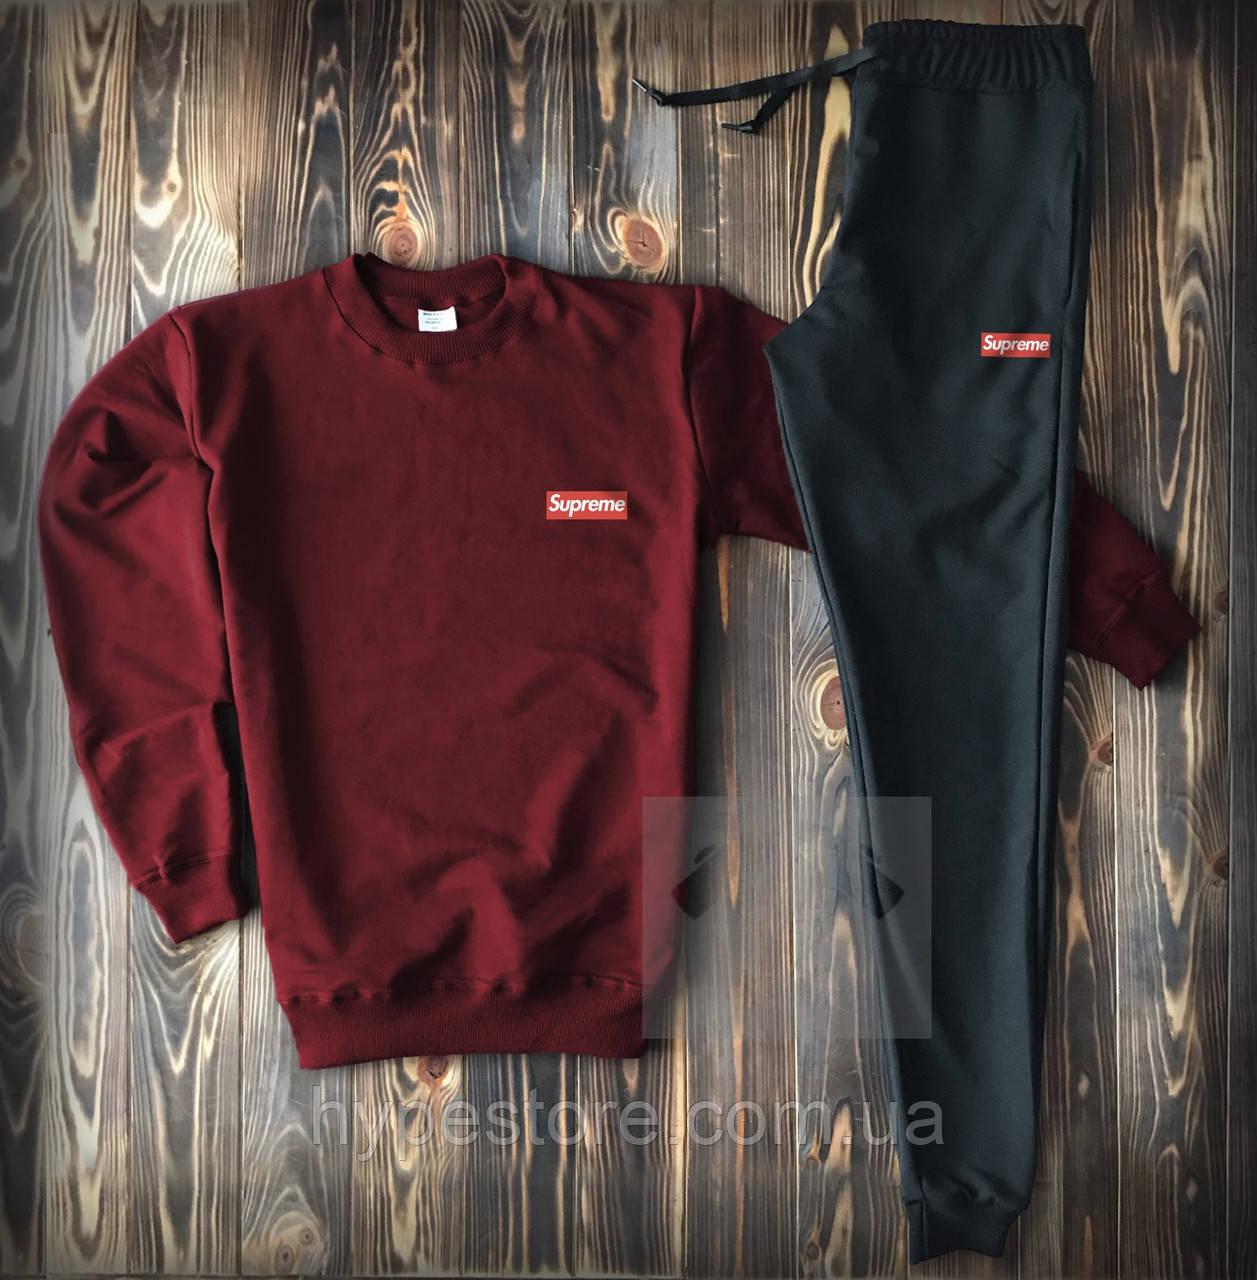 Мужской весенний спортивный костюм, чоловічий костюм Supreme (бордовый), Реплика